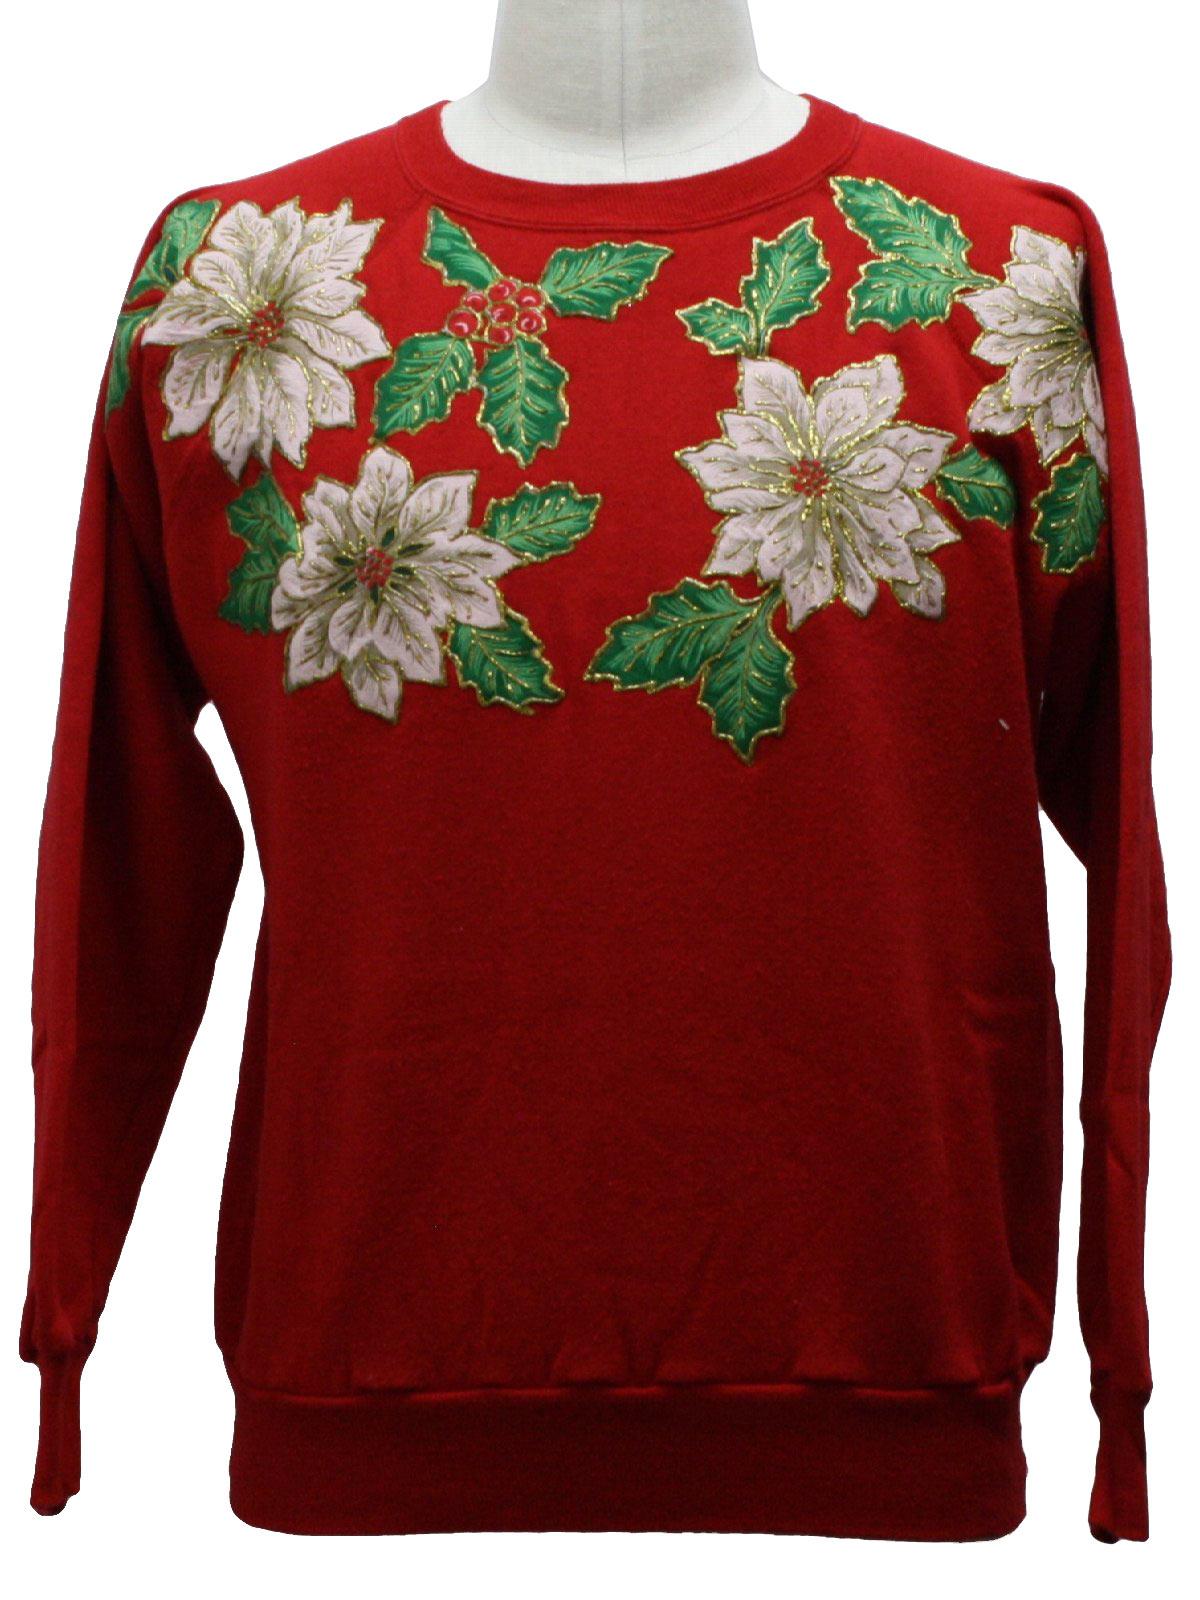 Ugly Christmas Sweatshirt: -Action- Unisex red, green ...